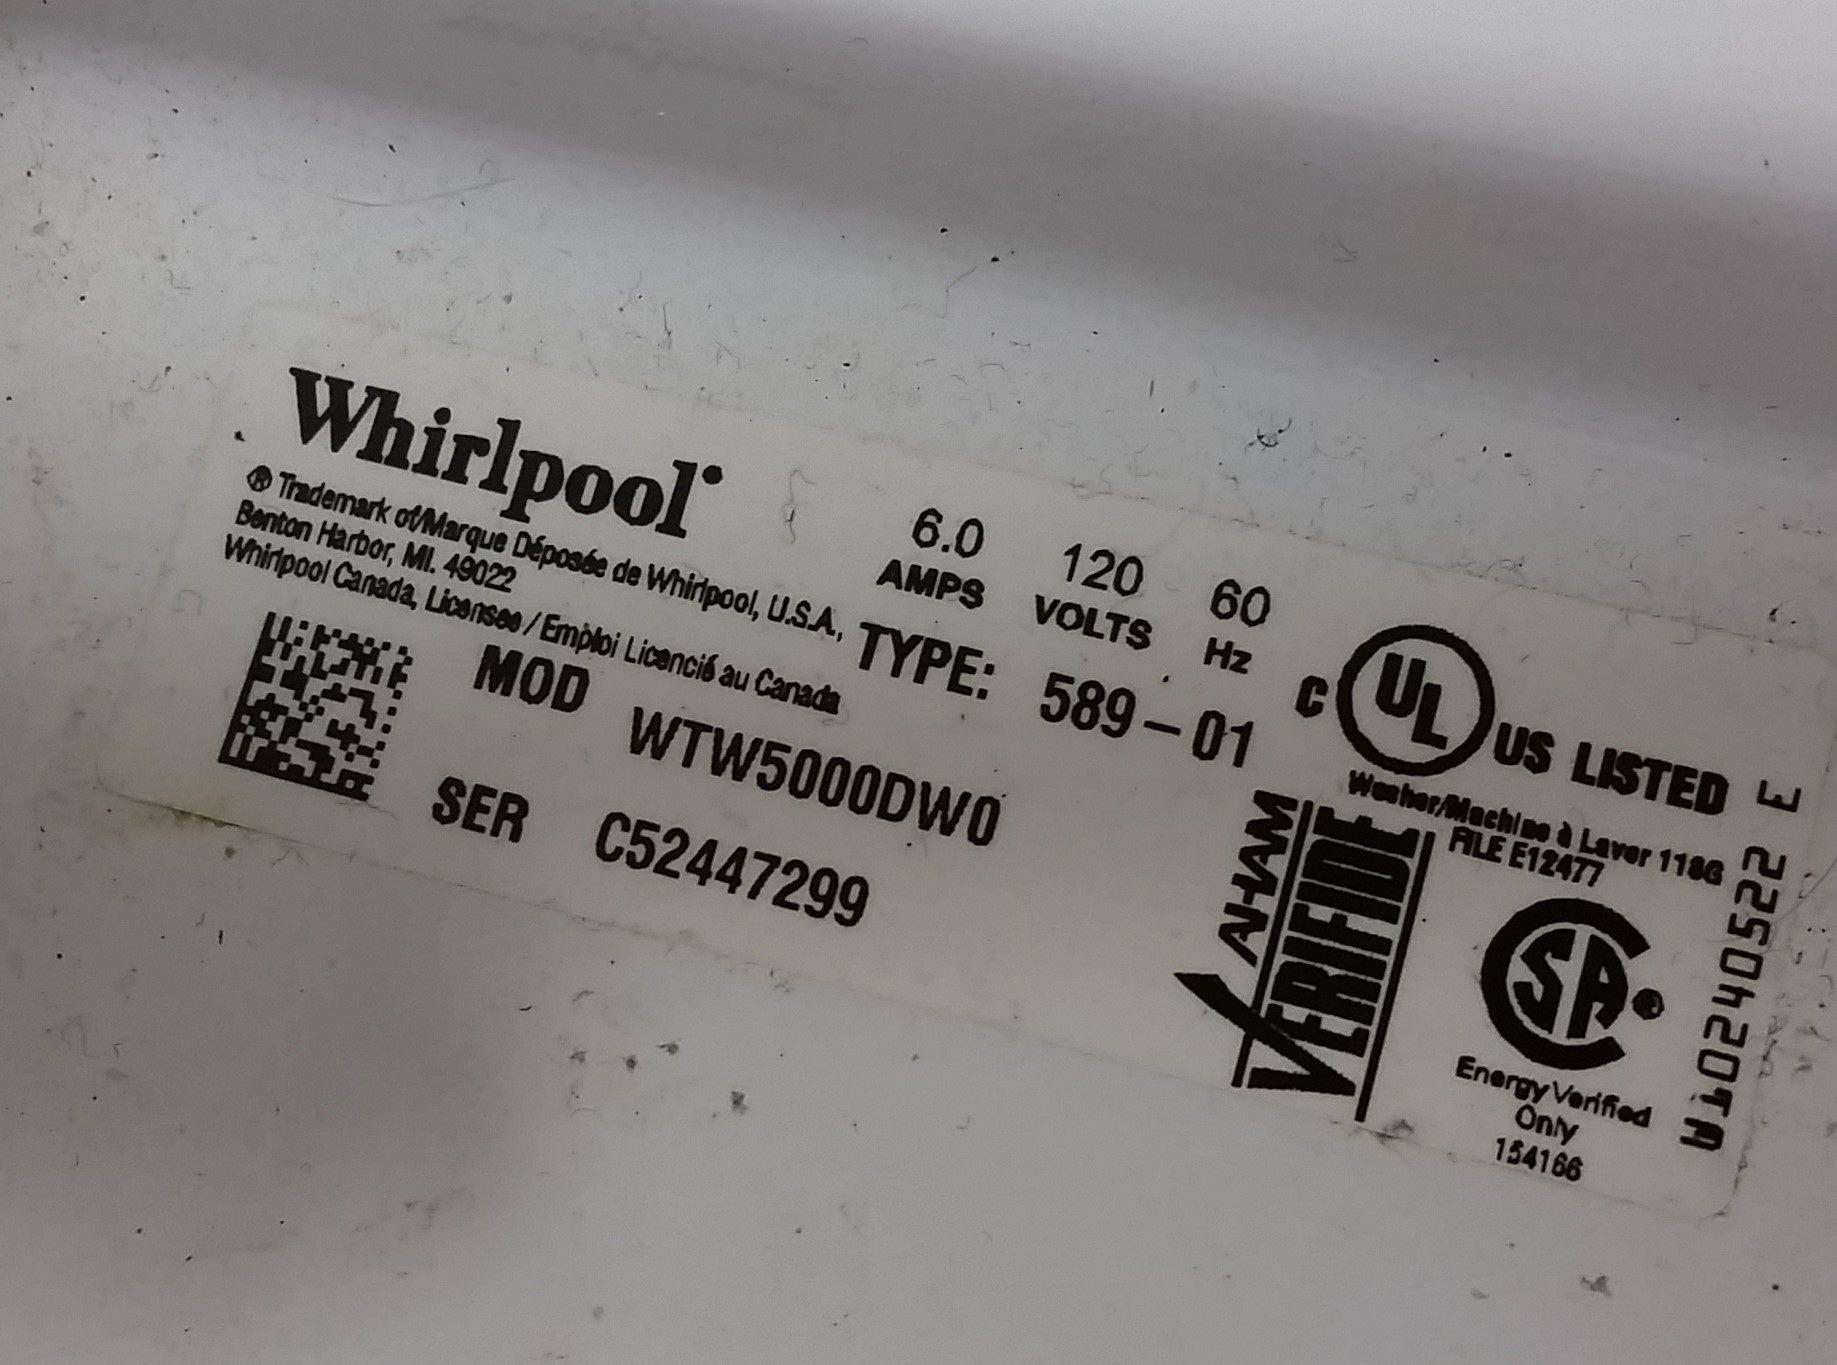 whirlpool washing machine model wtw5000dw